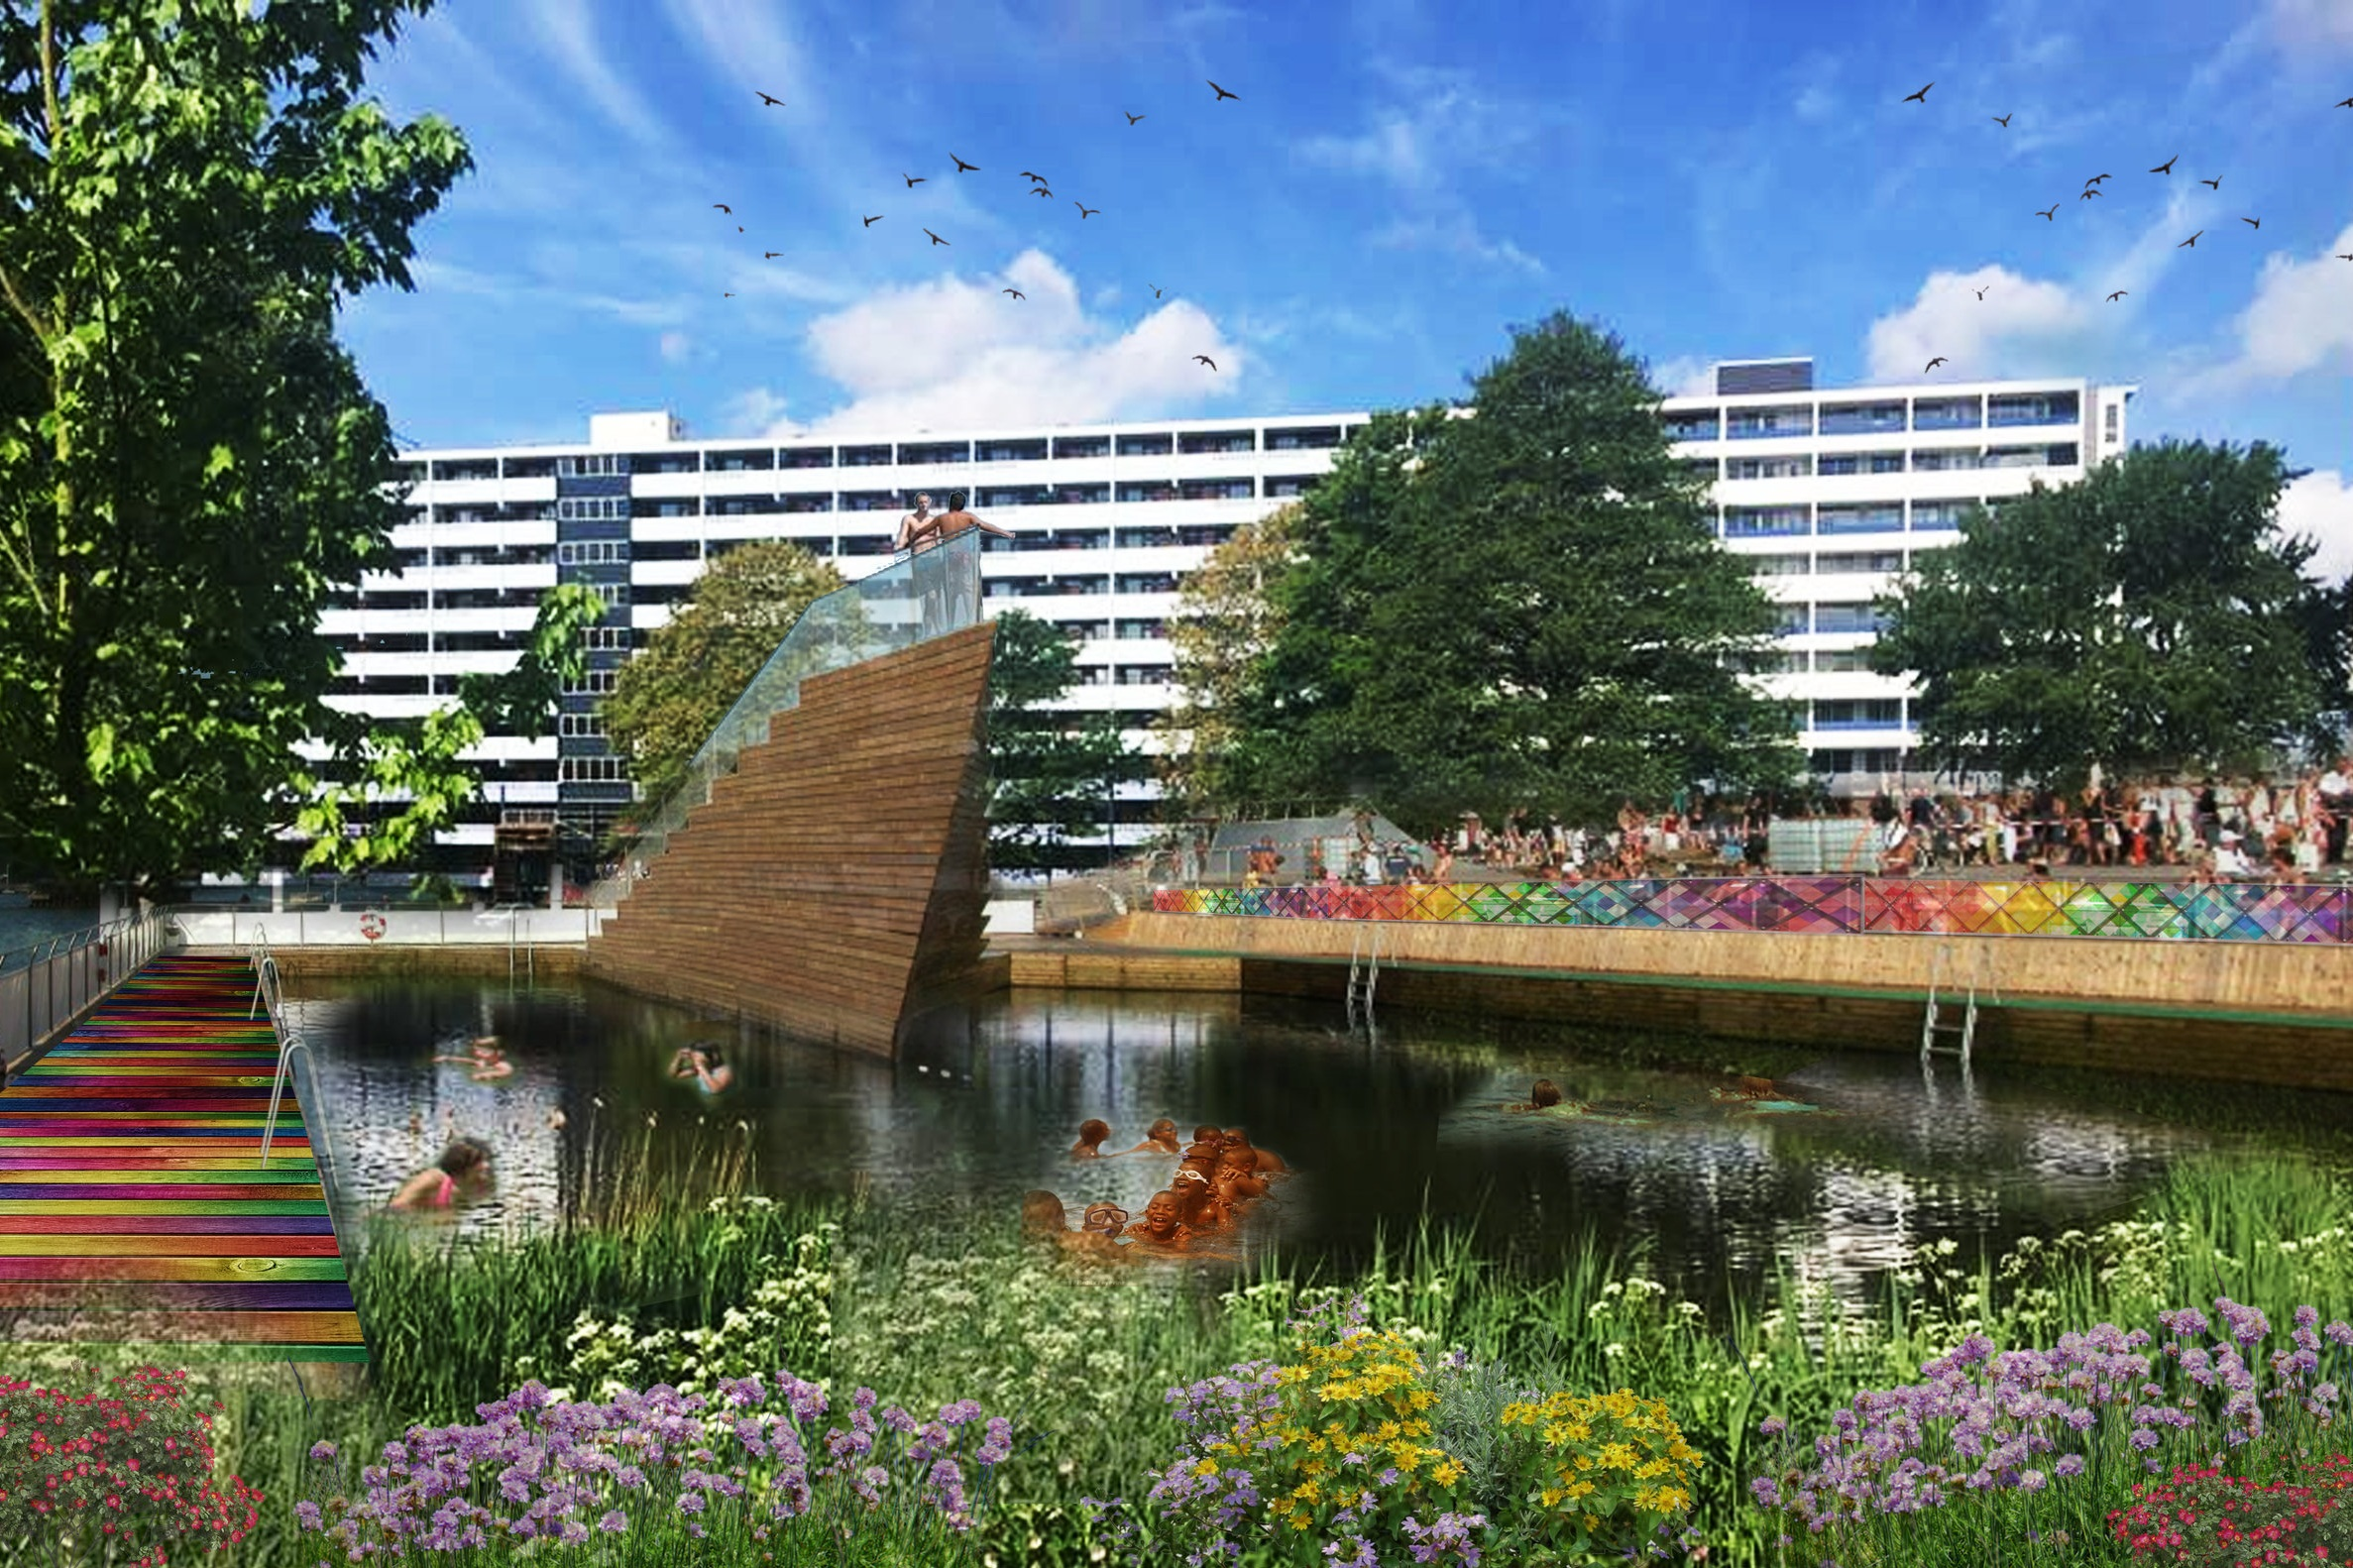 Zwembad EG Buurt_Placemaking Plus.jpg